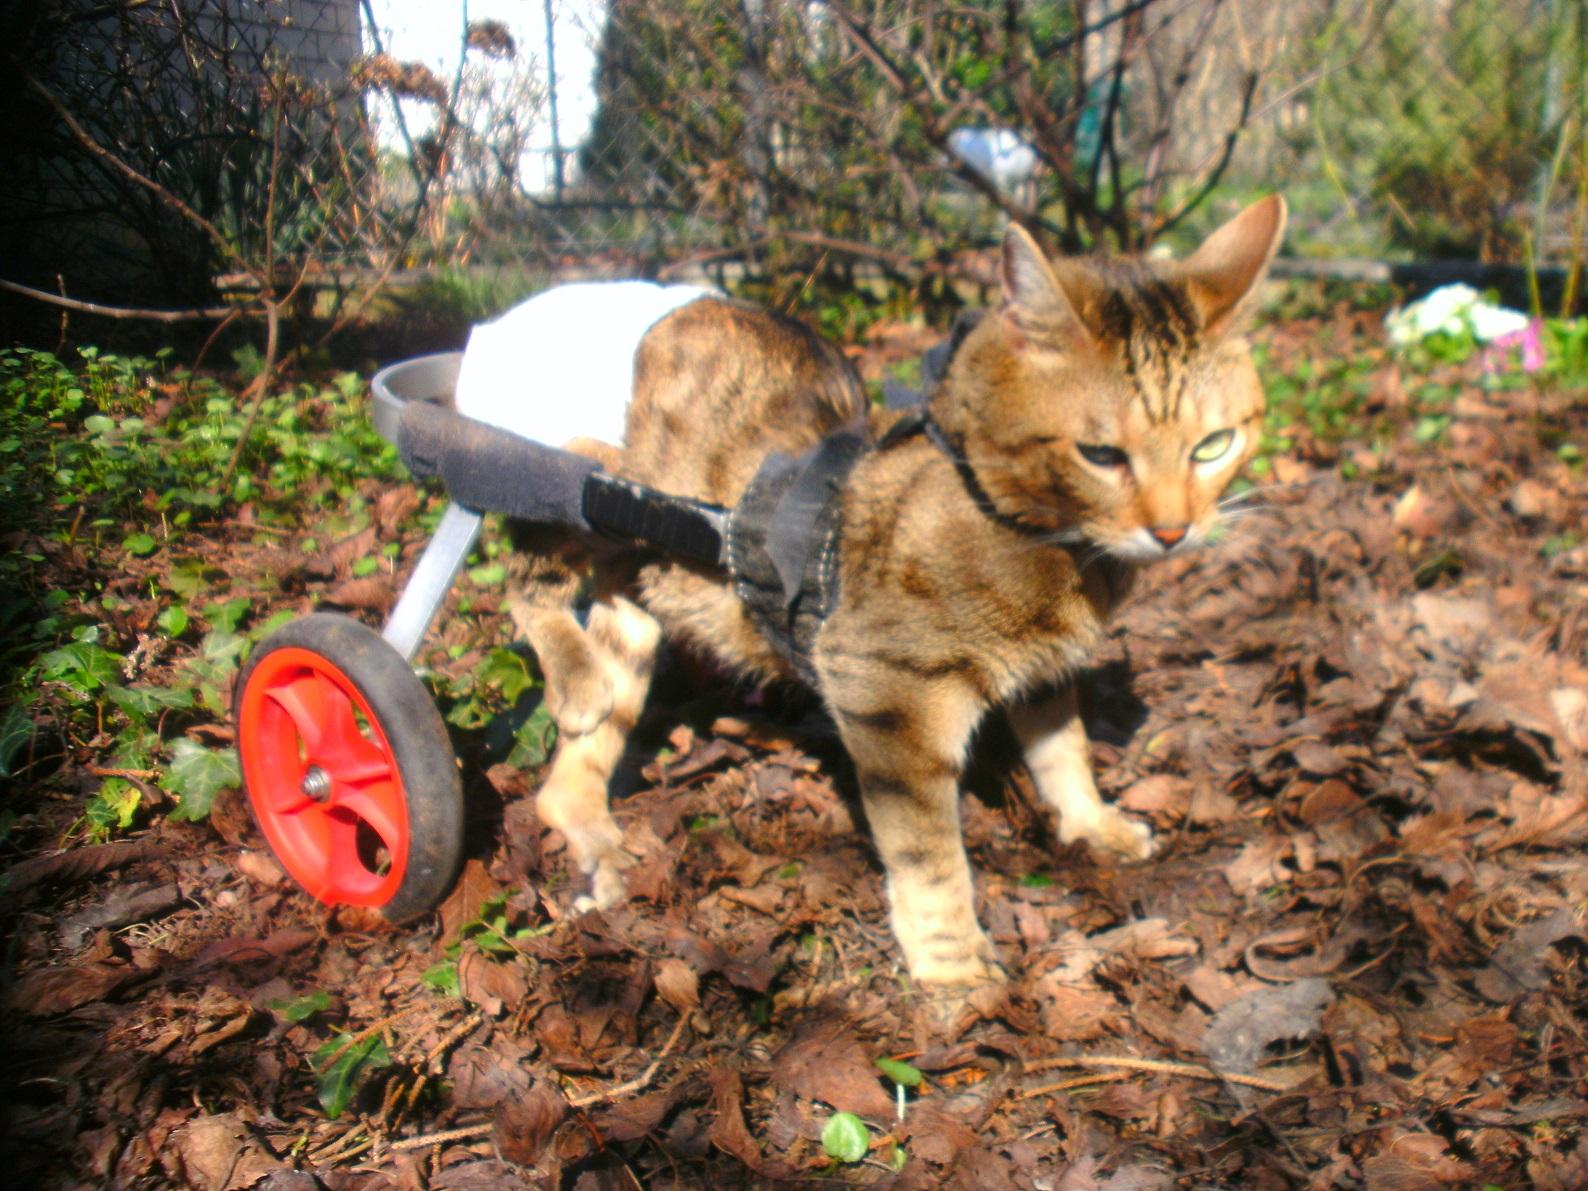 Katze_Rolli_stehend